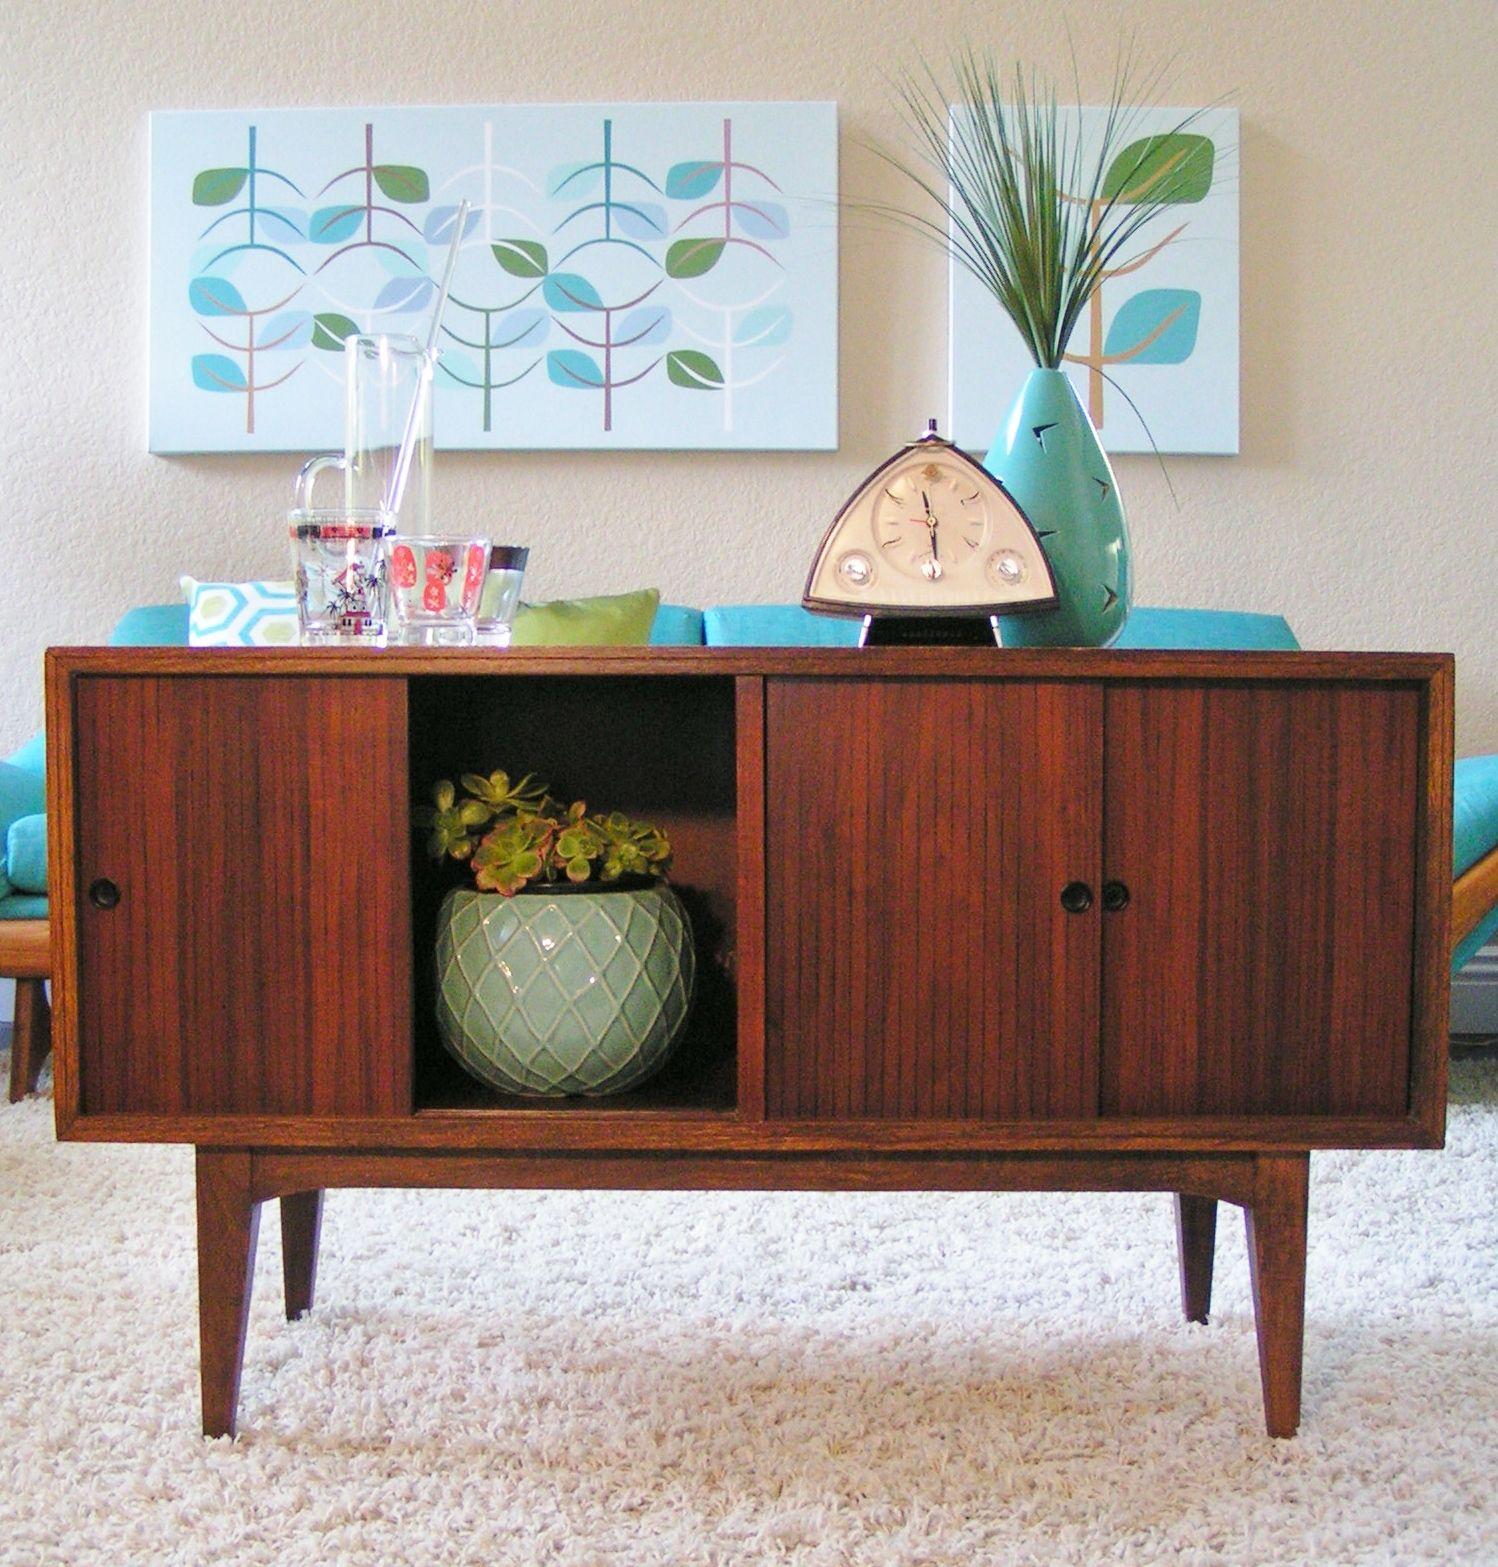 Mid Century Credenza Sleekandsimplelines.com Living Room Midcentury Credenza  Console Bar